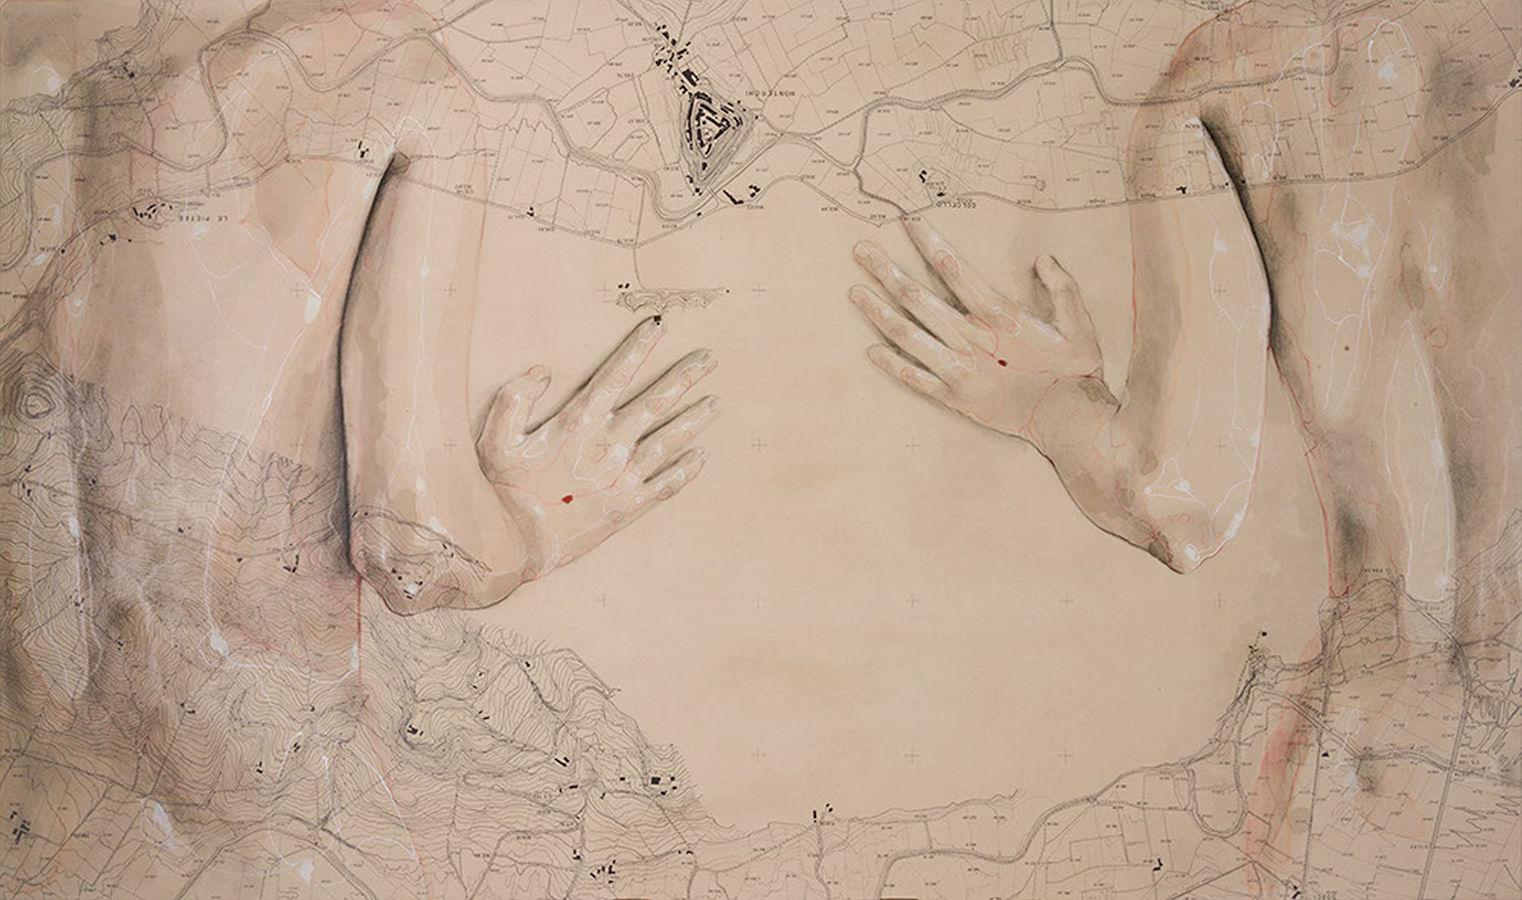 SENSI ARTE, Arbitrio,  mista su antica mappa su tavola, cm 100 cx 60_SRFL_07